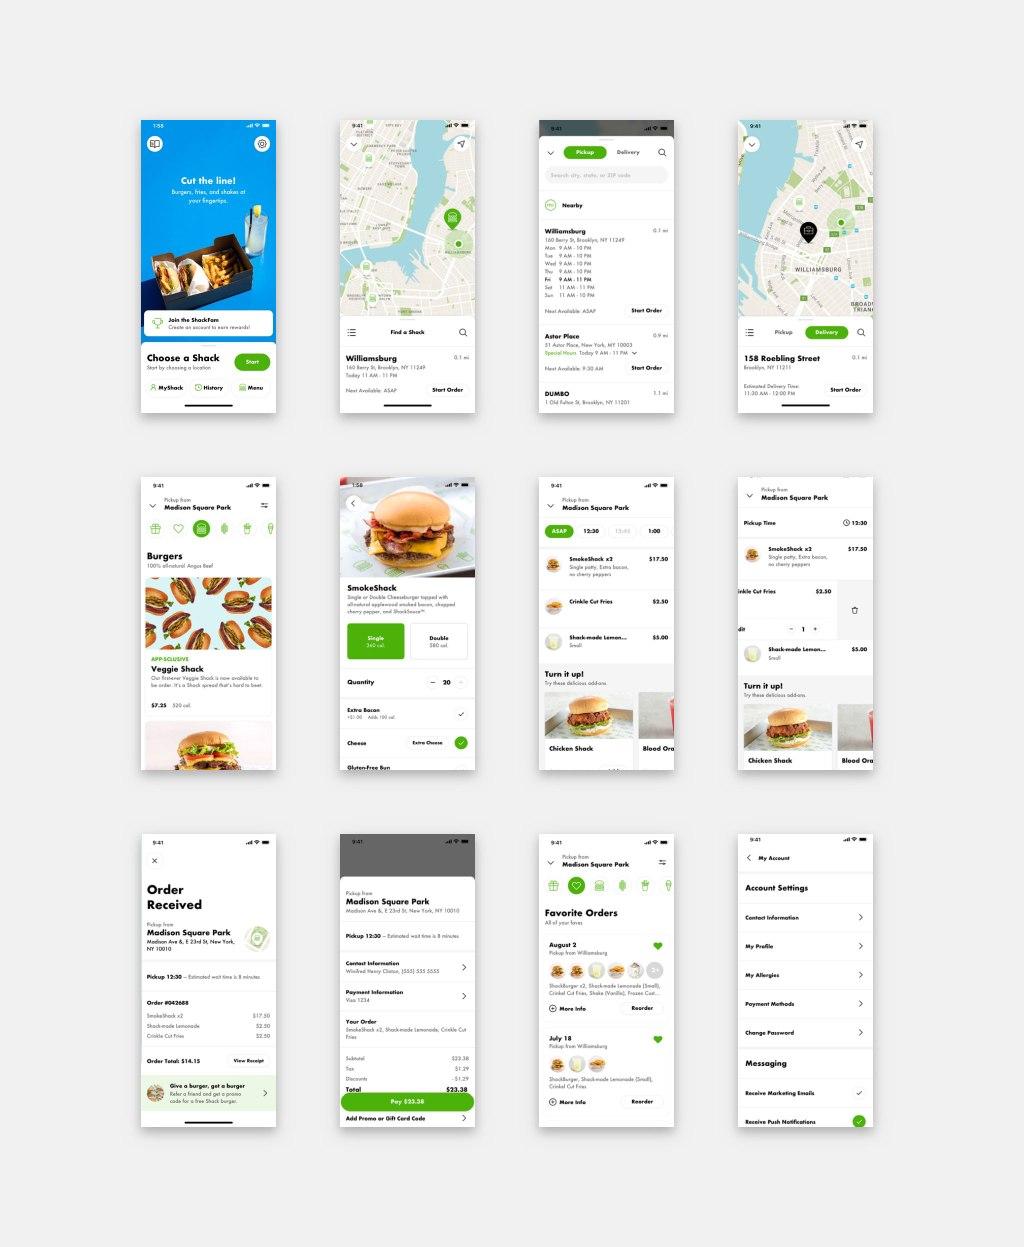 Shake Shack Mobile Ordering App Visual Design